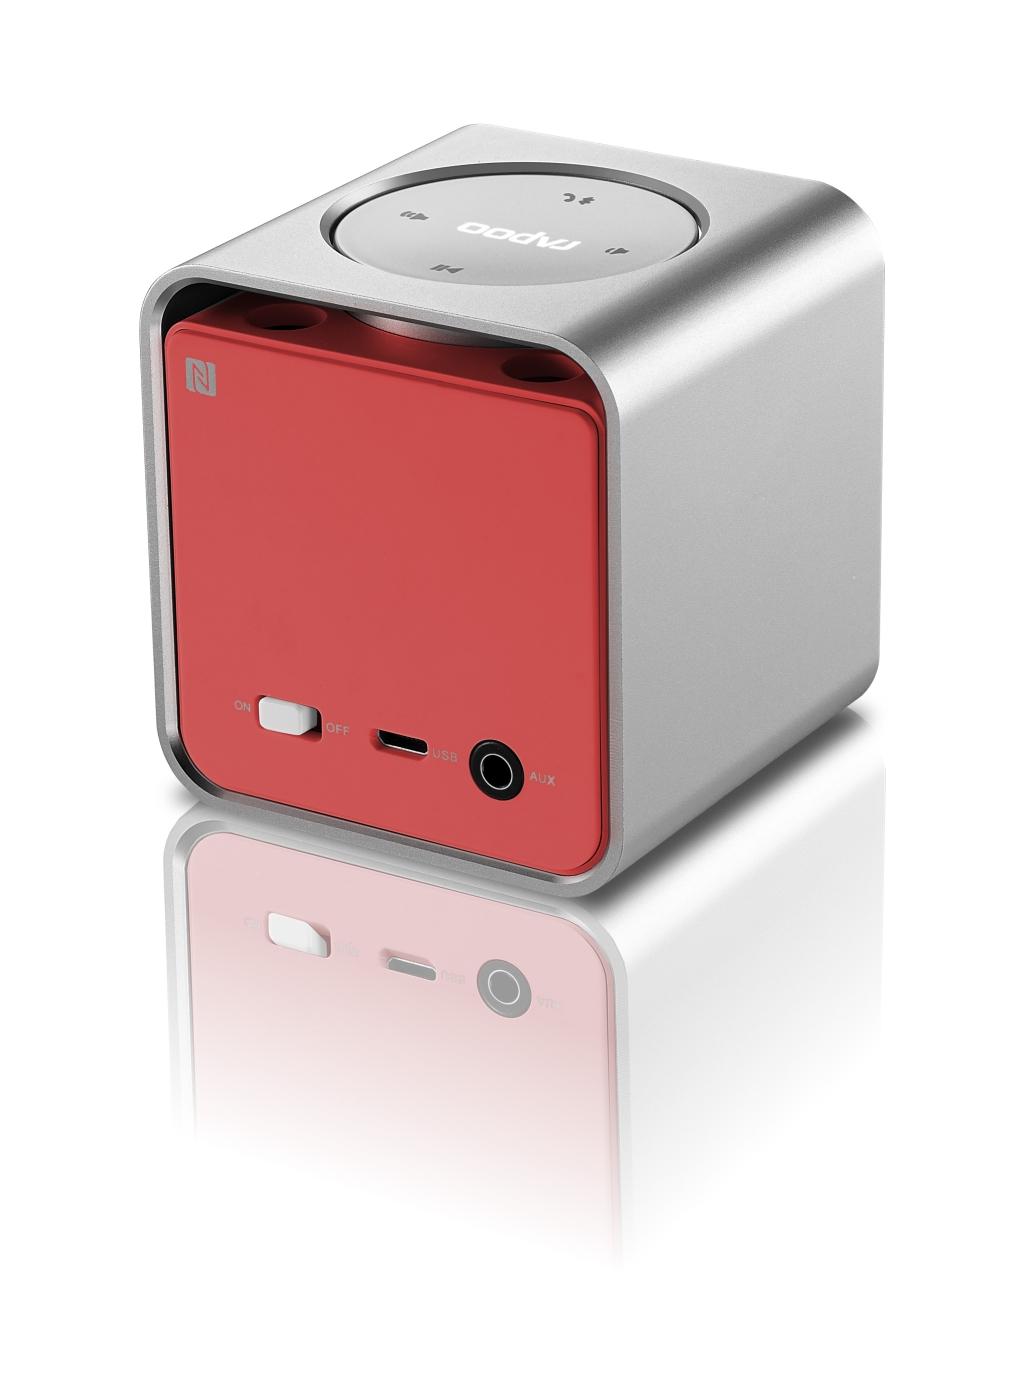 der neue a300 bluetooth nfc mini lautsprecher hardware. Black Bedroom Furniture Sets. Home Design Ideas